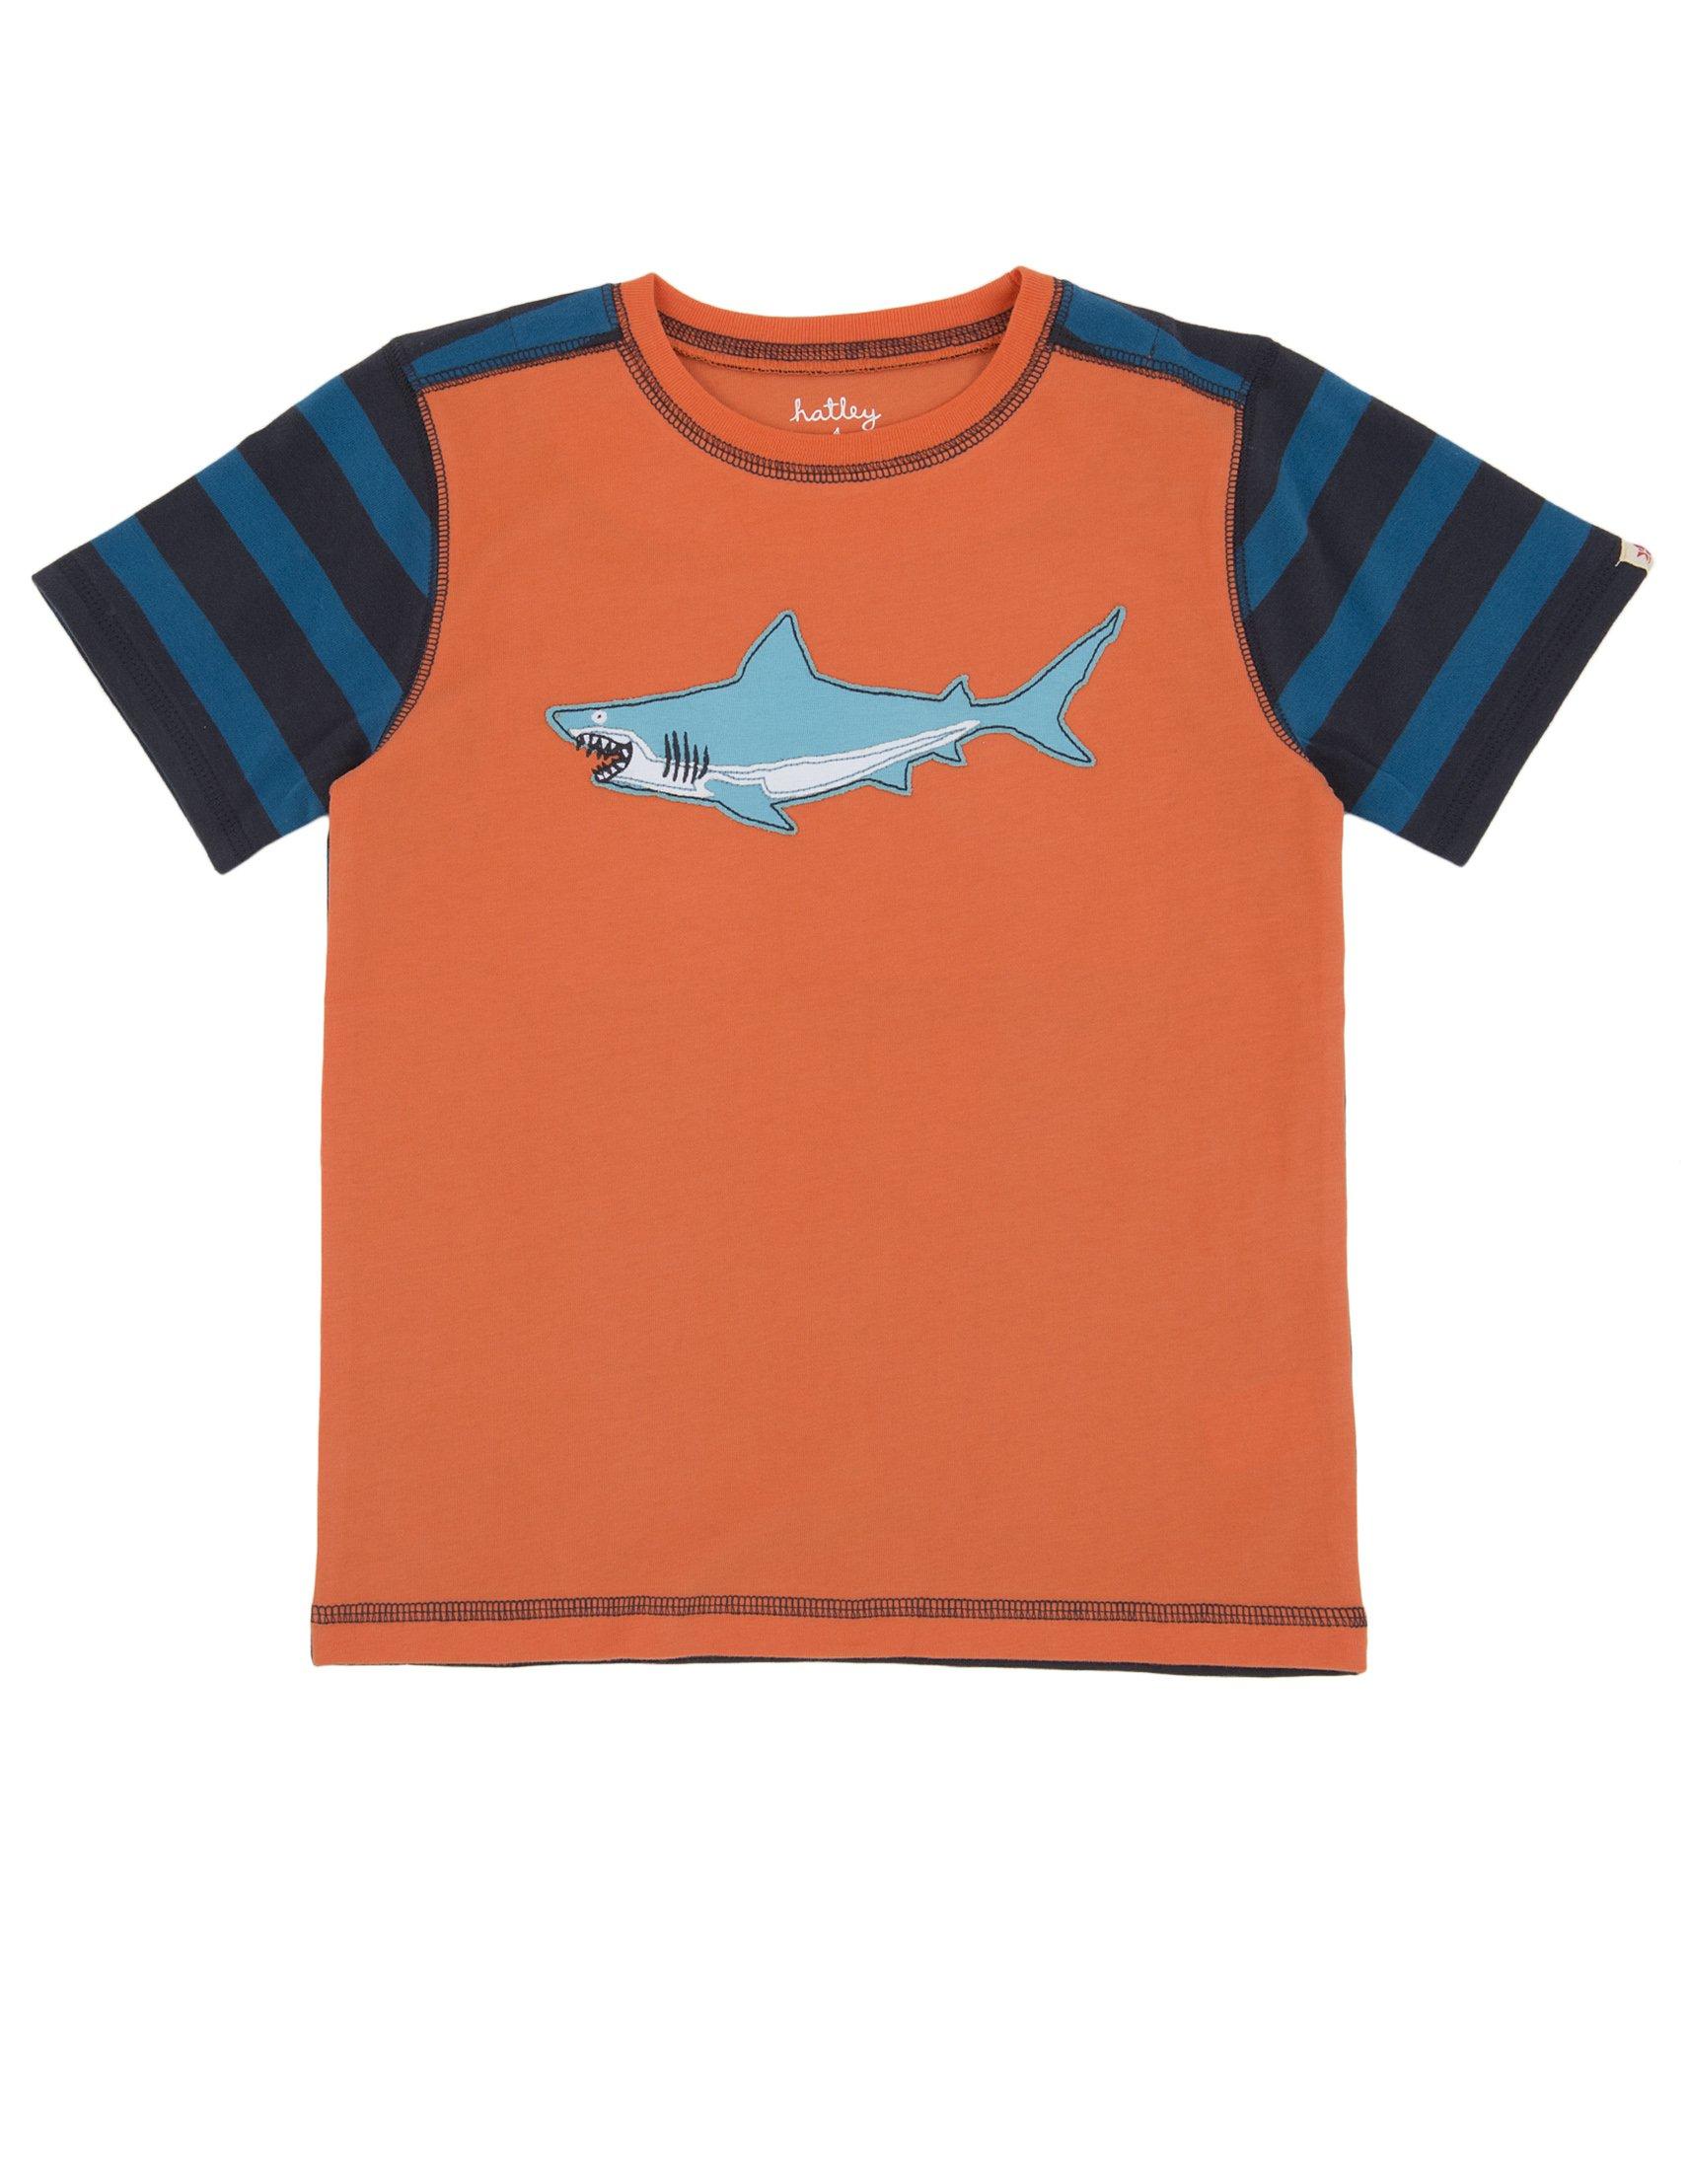 Hatley Little Boys' Boys Applique Tee Shark, Orange, 4T by Hatley